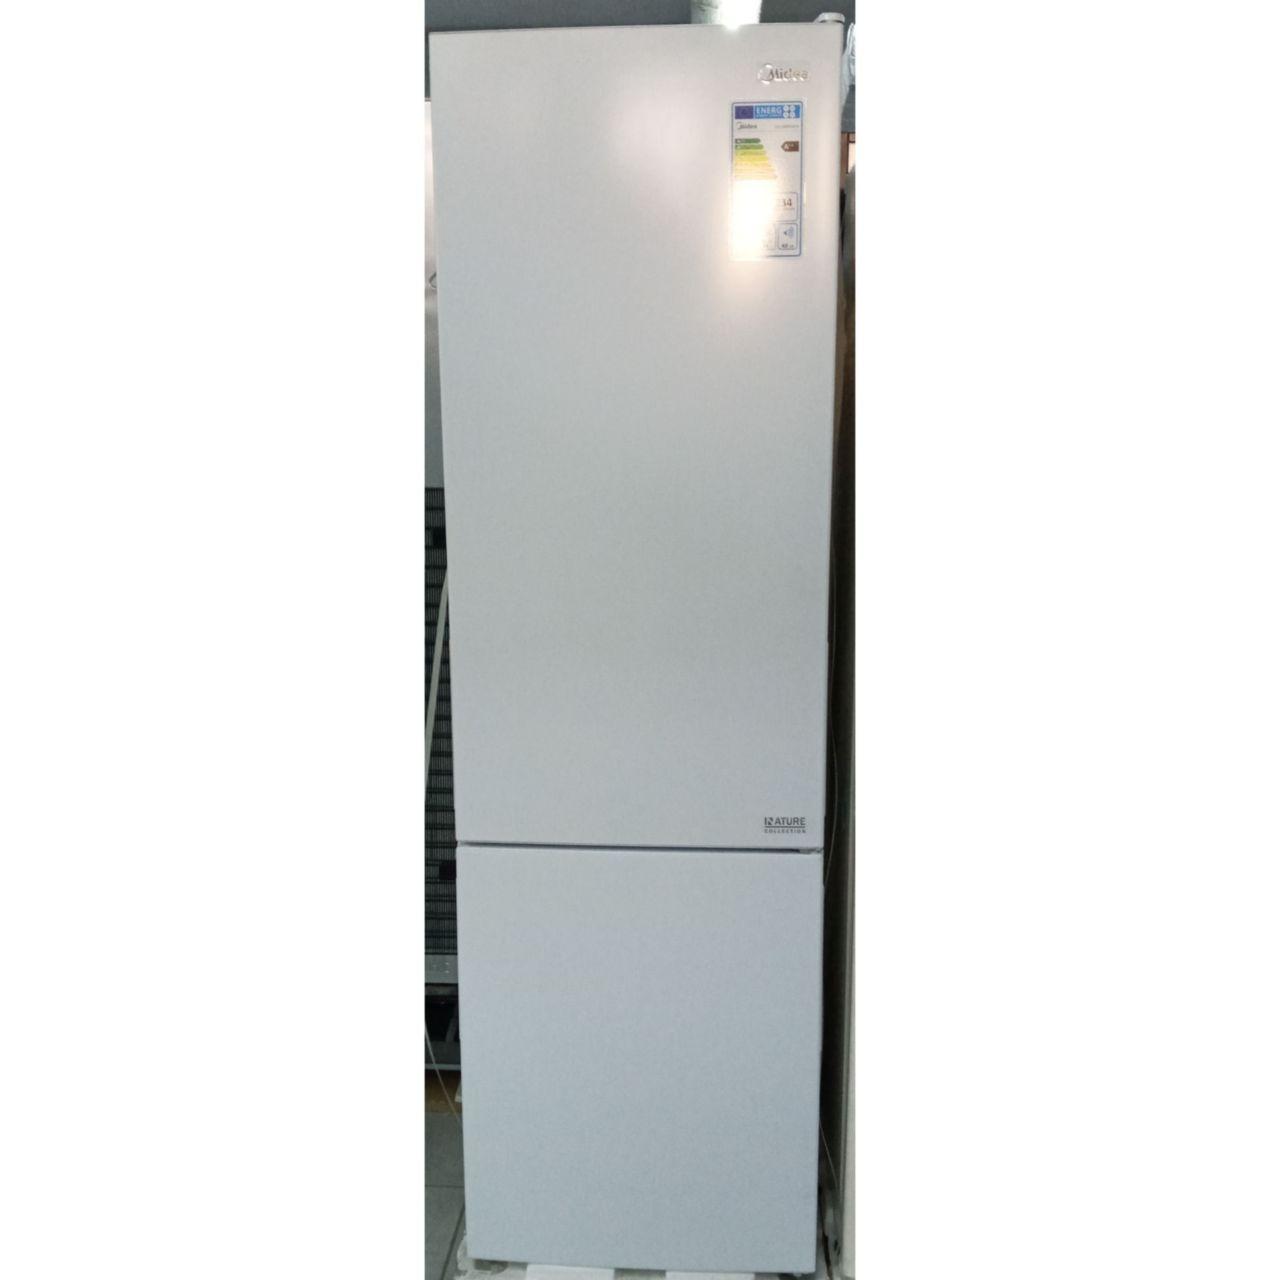 Холодильник двухкамерный Midea 321 литр